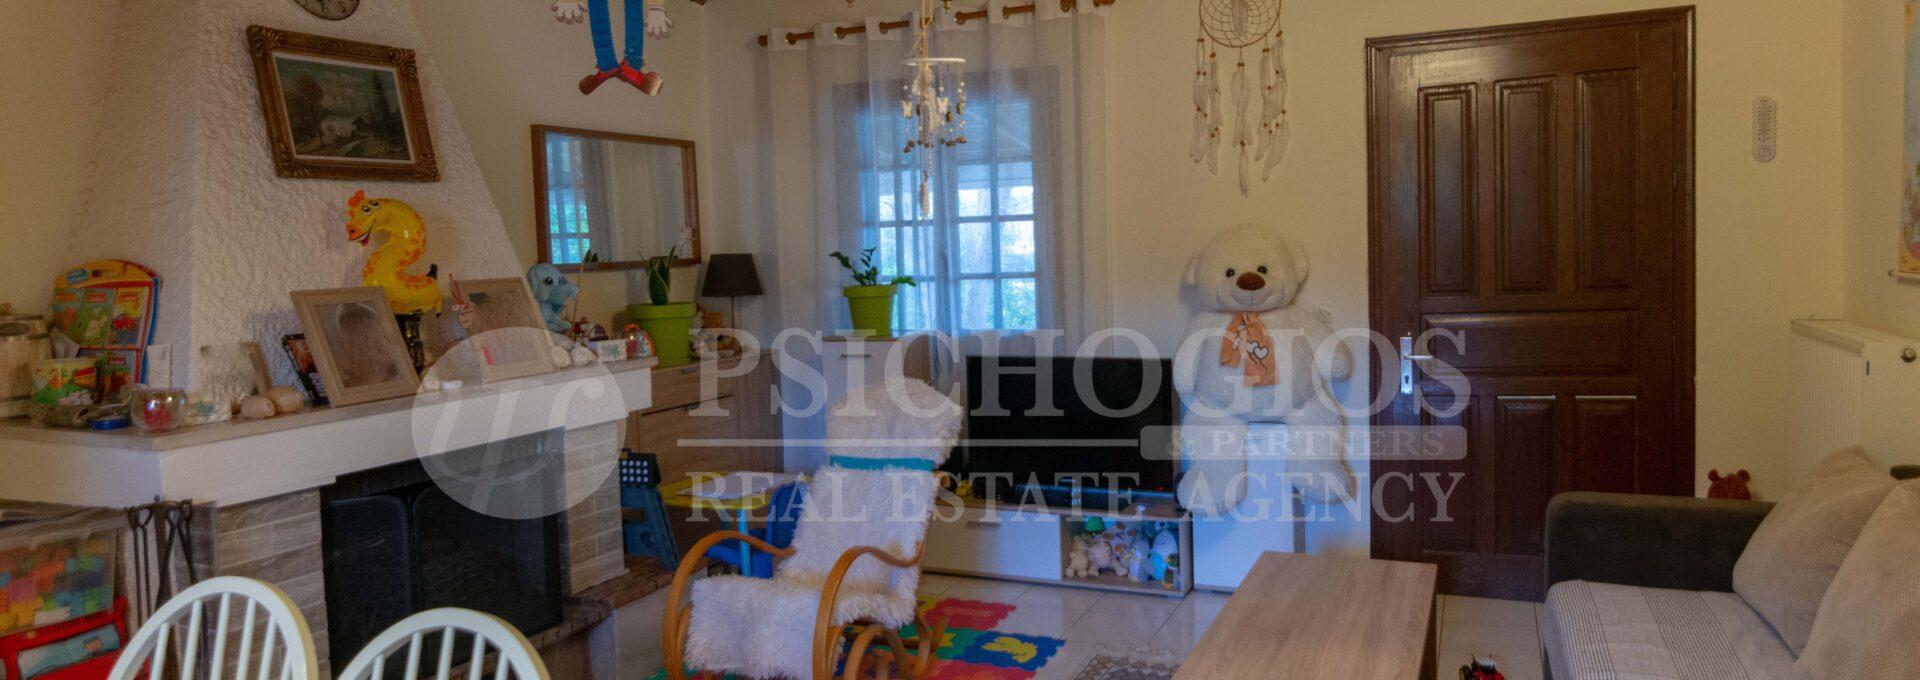 for_sale_two_houses_plot_2000_sq.m._view_ermioni_greece 1 (25)